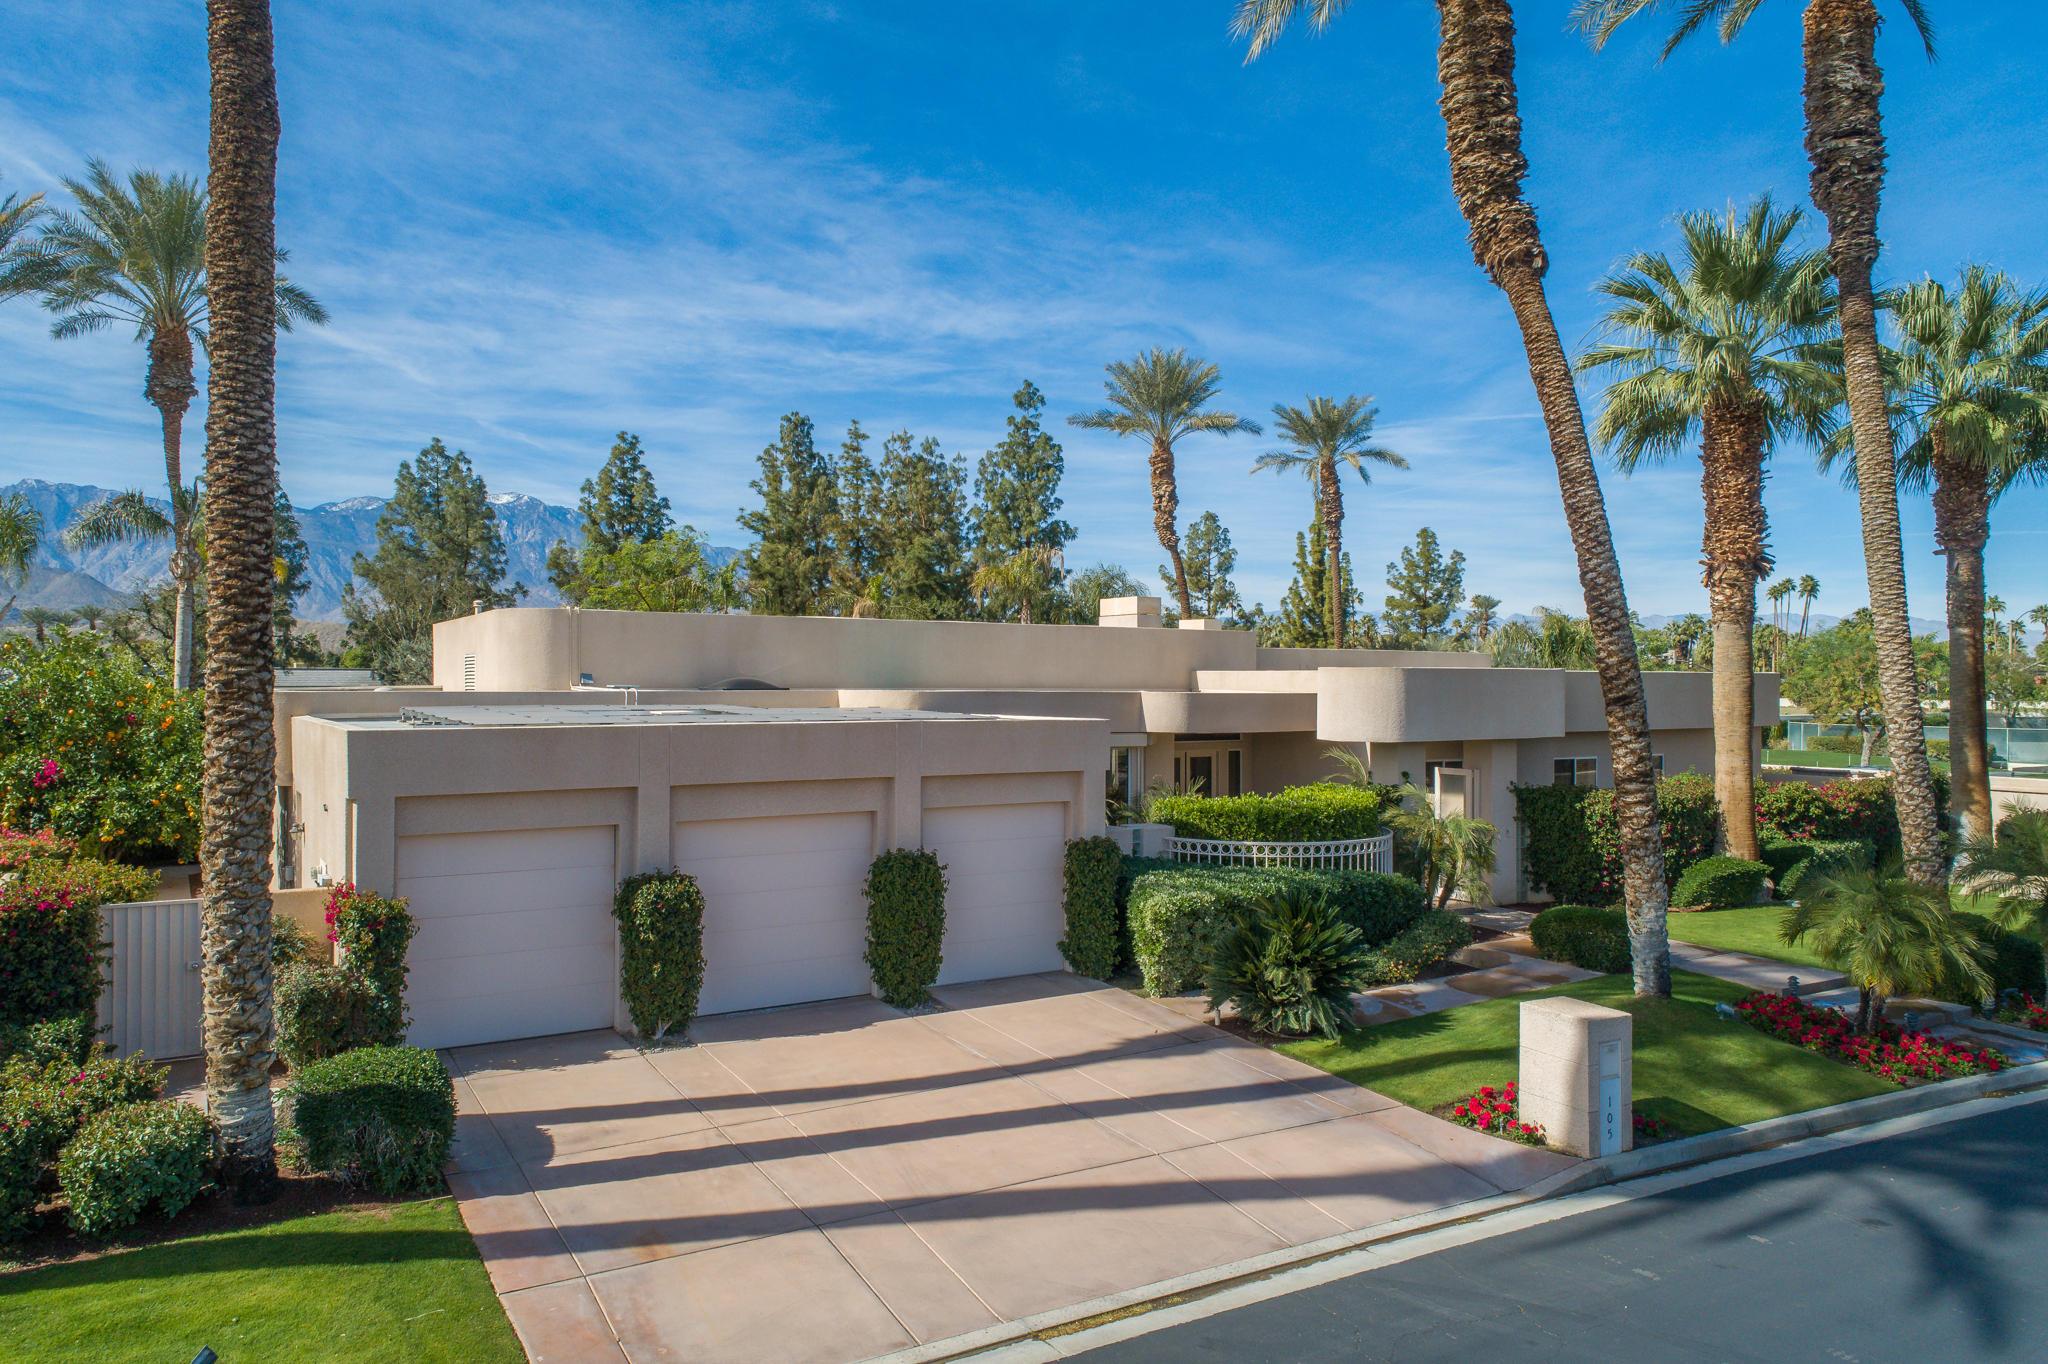 Photo of 105 Waterford Circle, Rancho Mirage, CA 92270